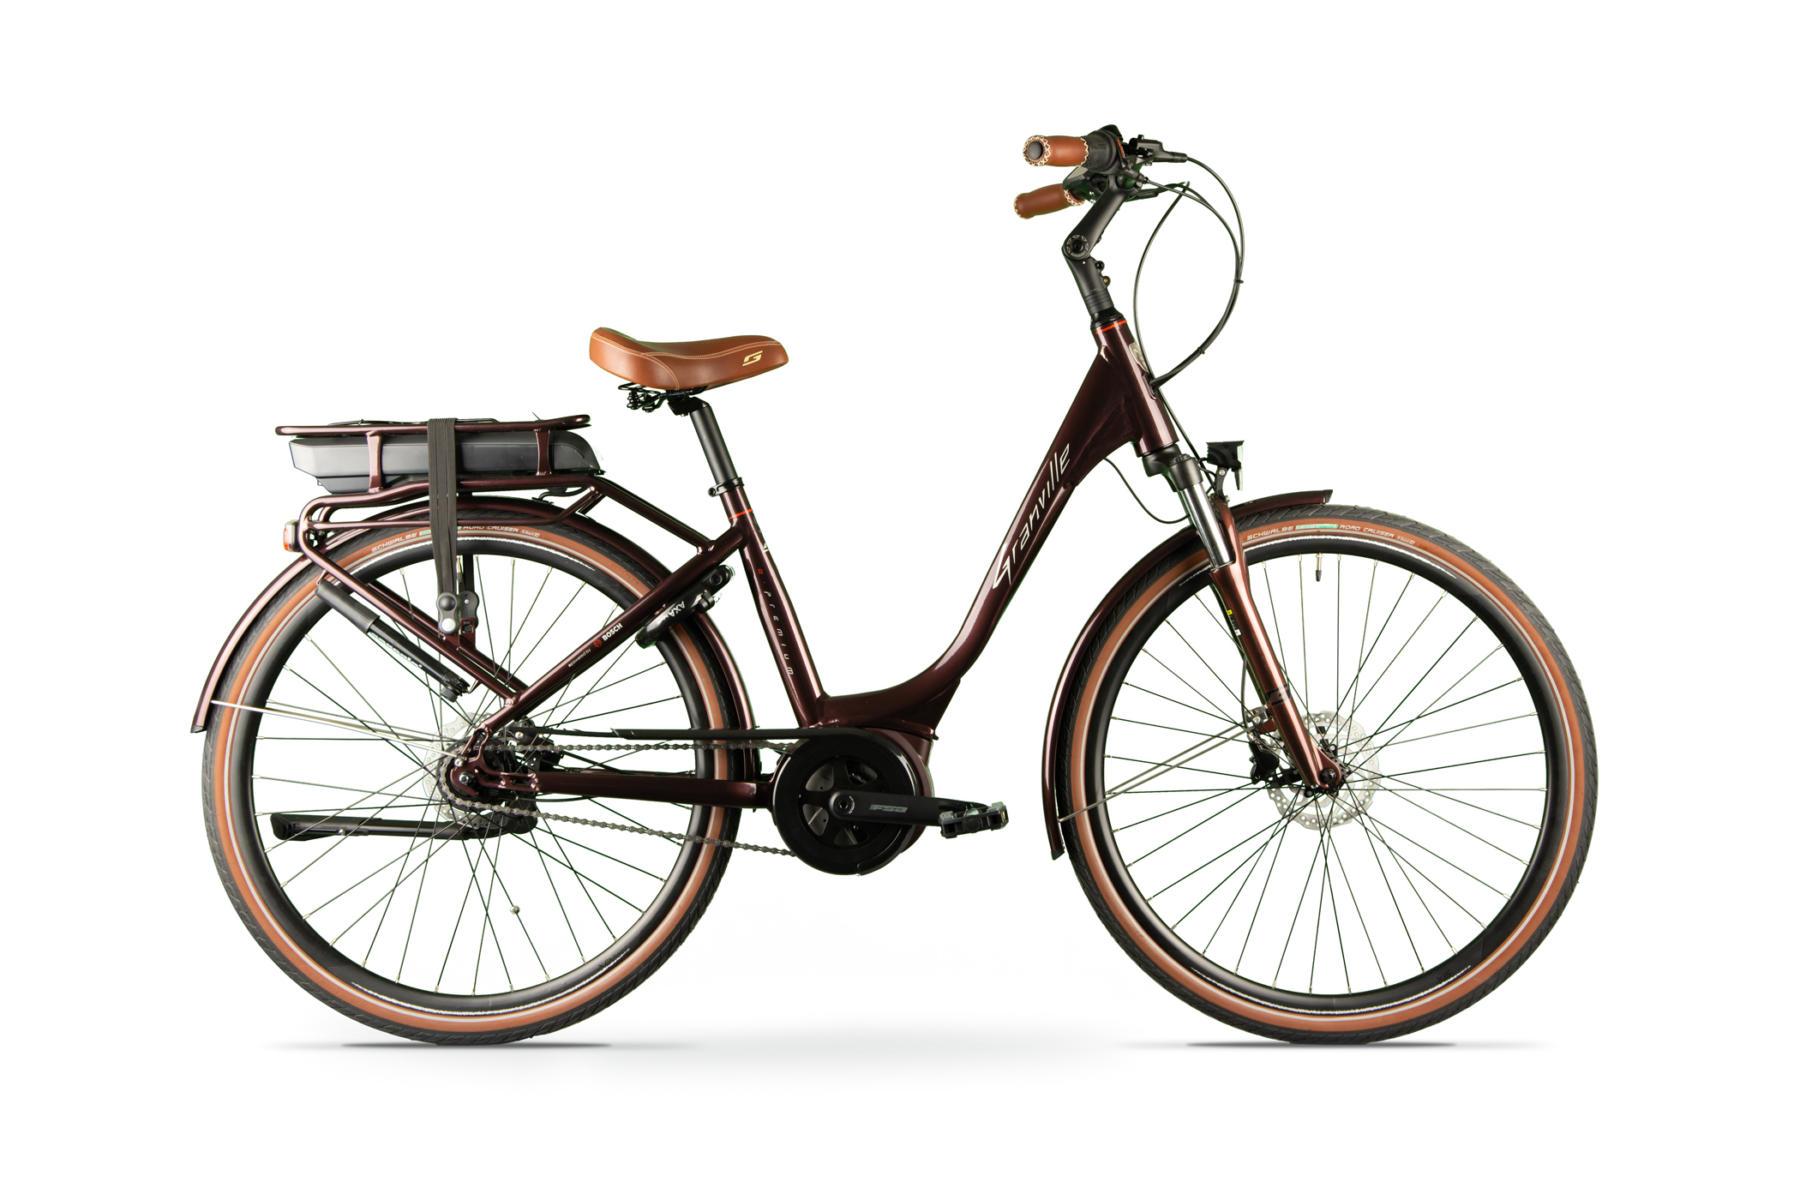 Granville-E-Premium-30-All-Bikes-Putte-Ludwig-Wynants-racefietsen-elektrische-fietsen-mountainbikes-koersfiets-kopen-herstellingen